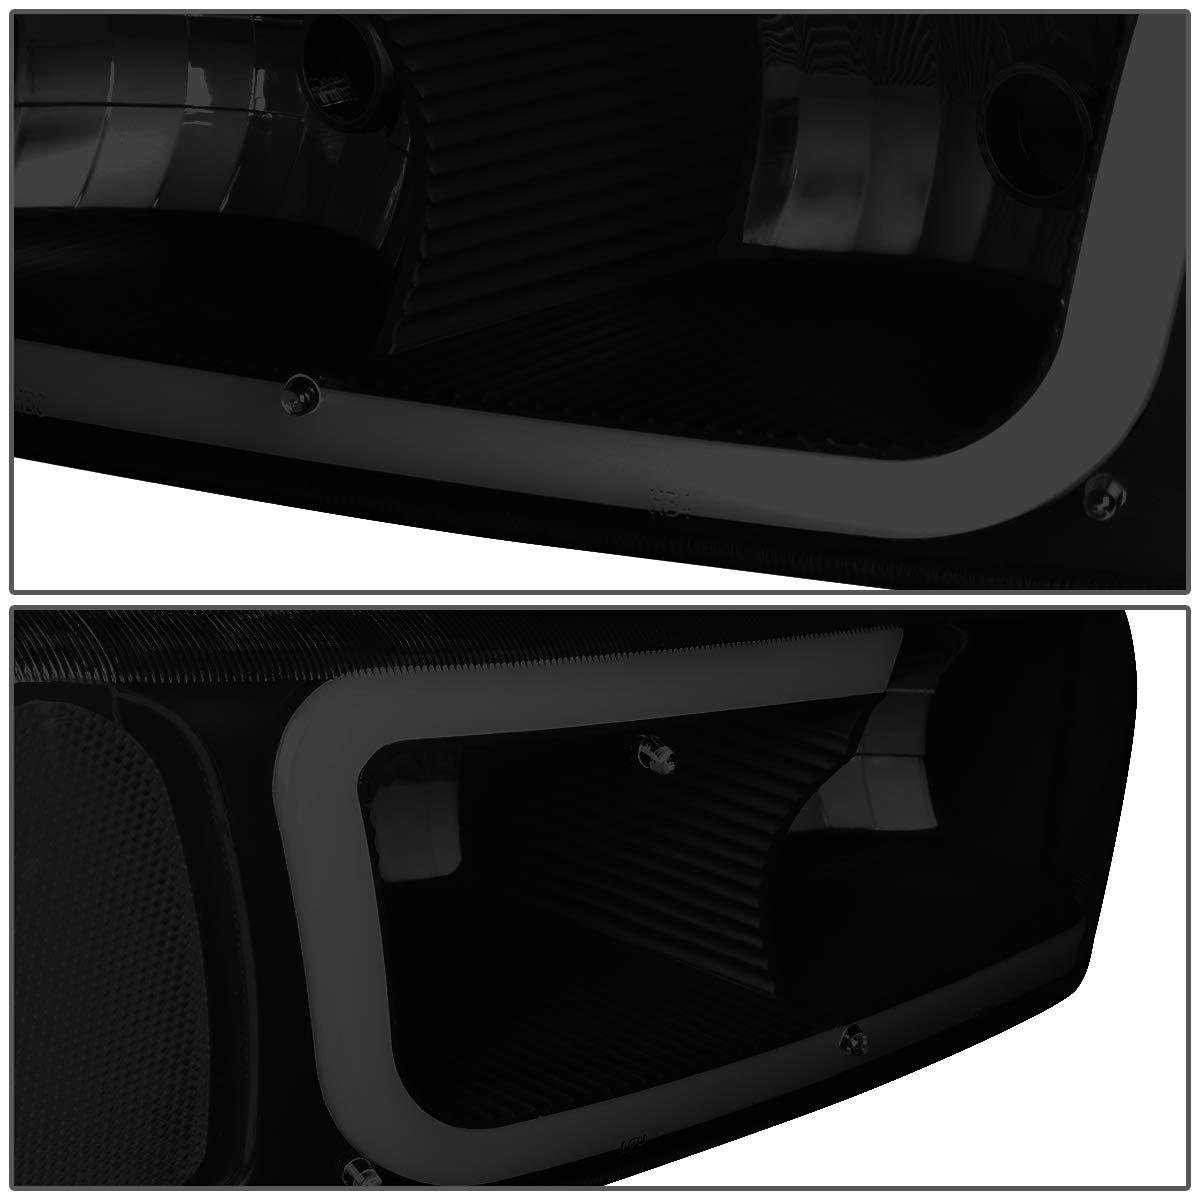 DNA Motoring HL-LB2-SIERRA99-BK-SM-CL1 LED DRL Front Driving Headlight+Turn Signal Bumper Lamps Upgrade